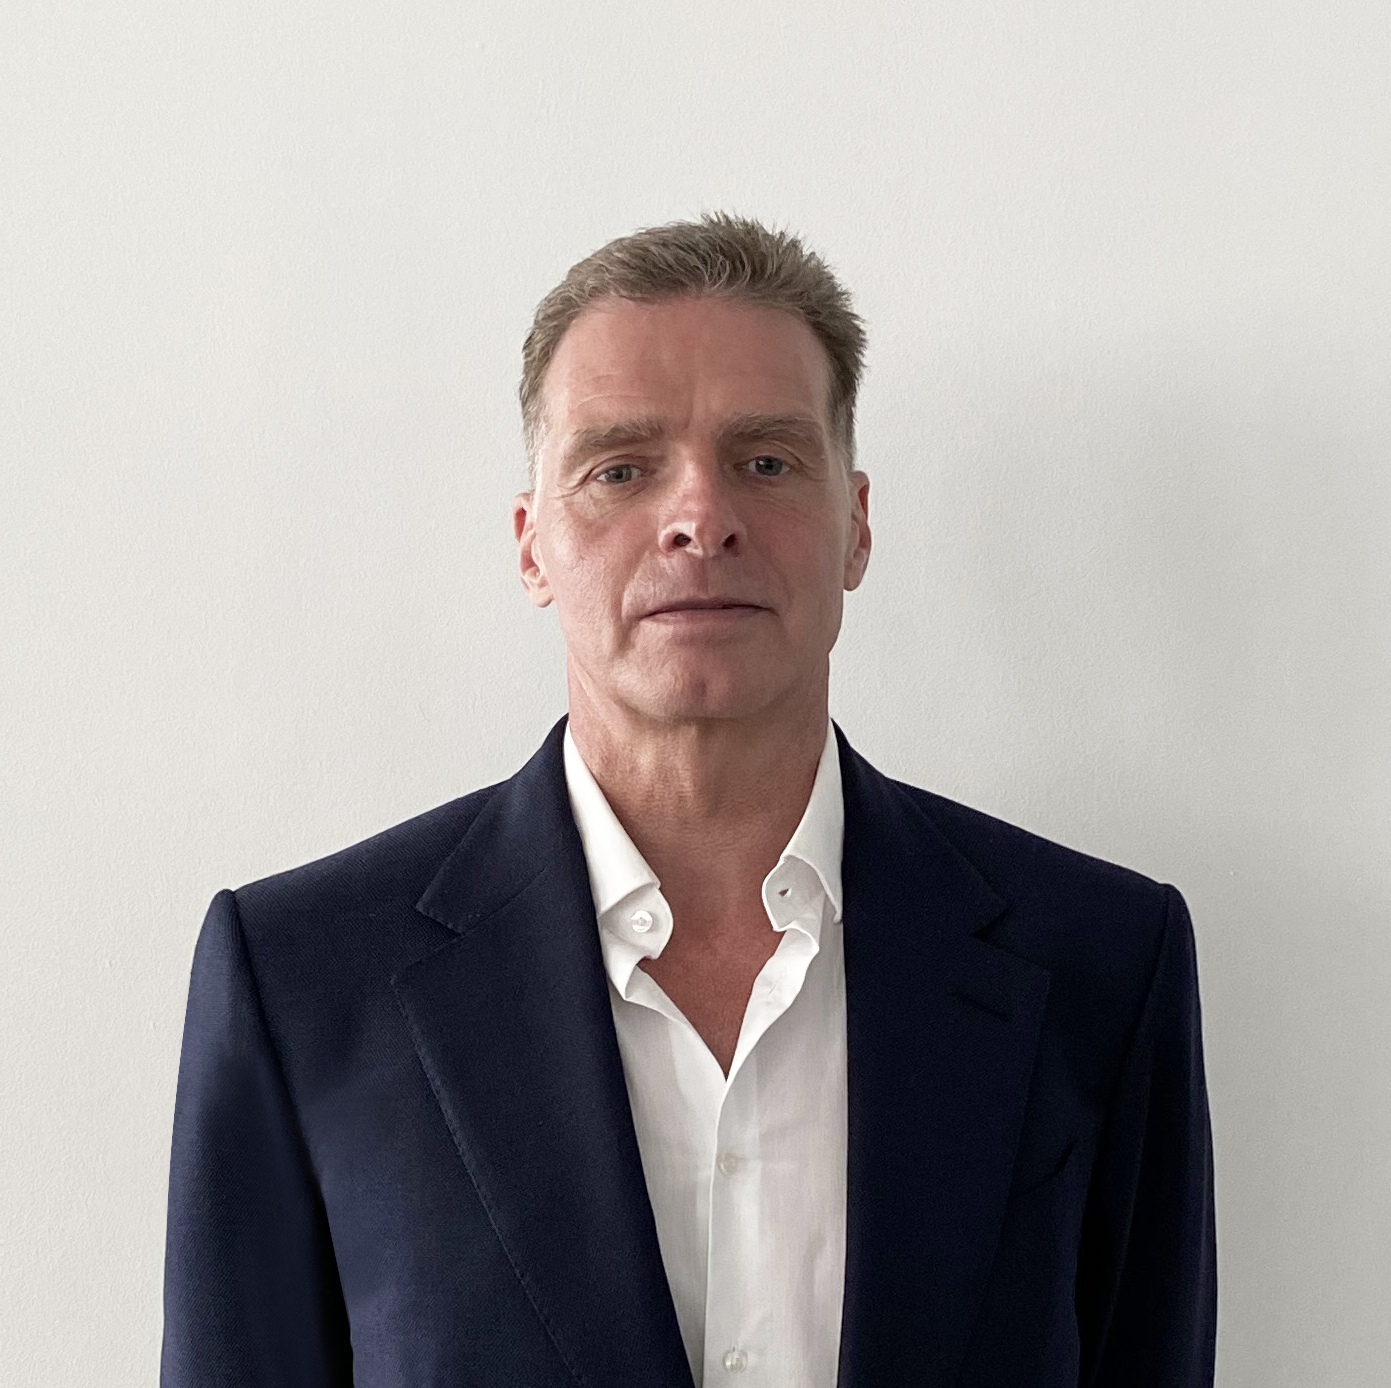 Matthias Thoma, the new owner of Paule Ka.